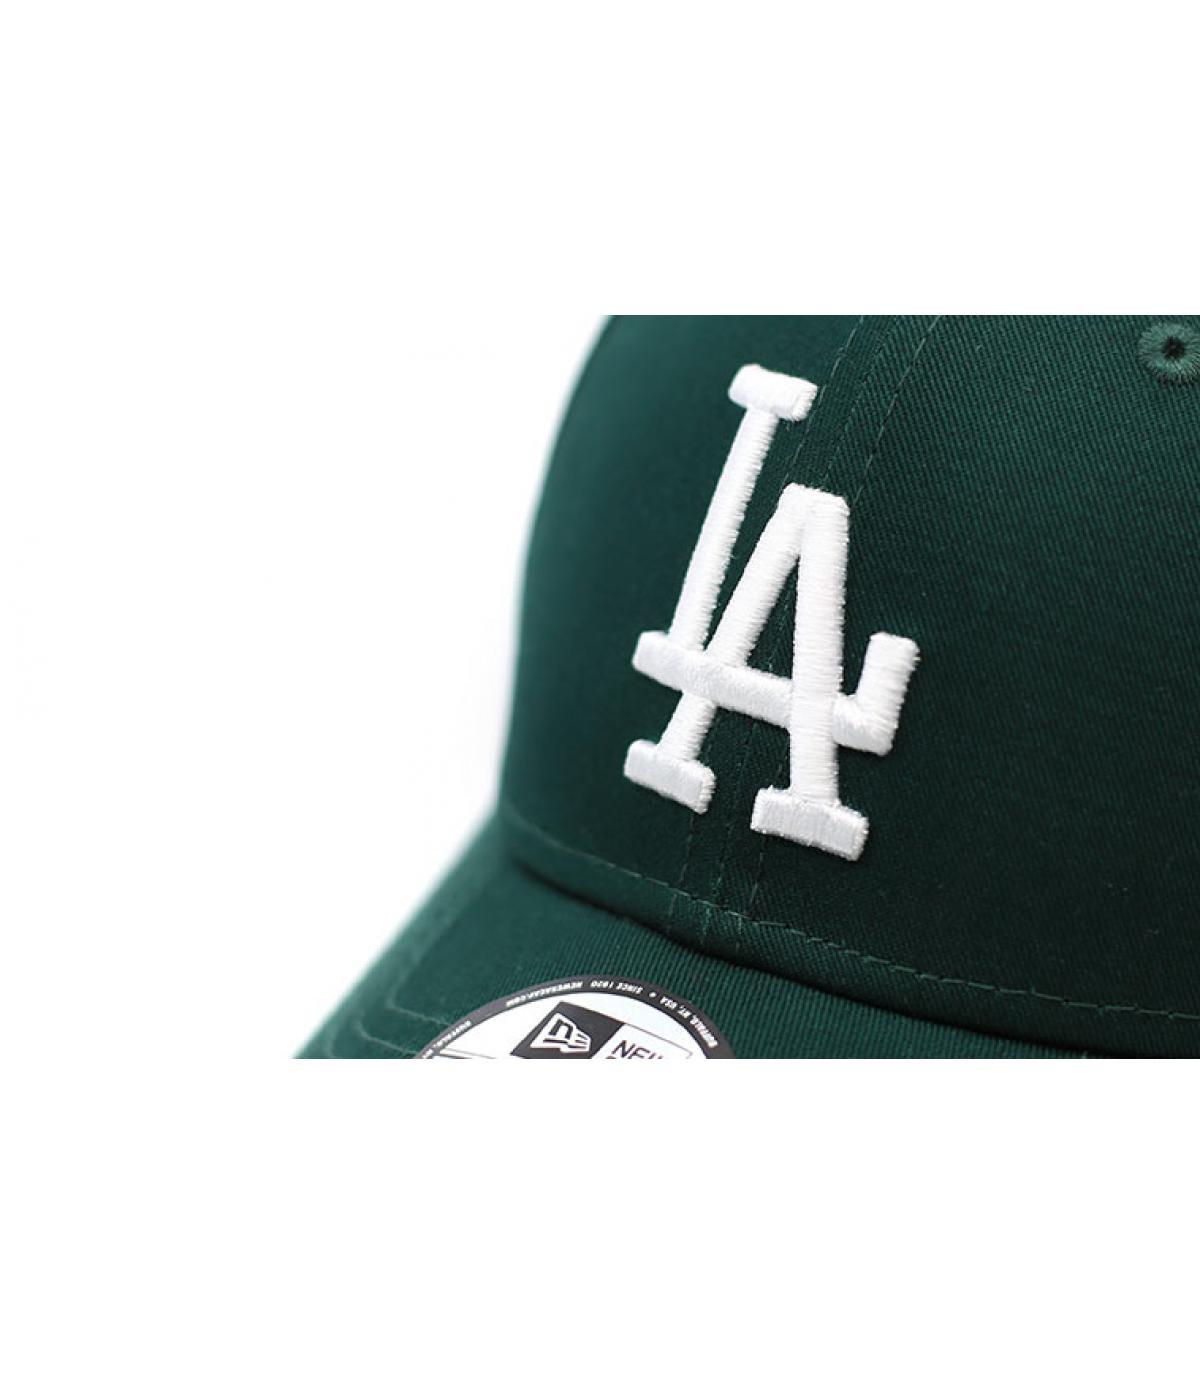 Details Kids League Ess LA 9Forty dark green - afbeeling 3